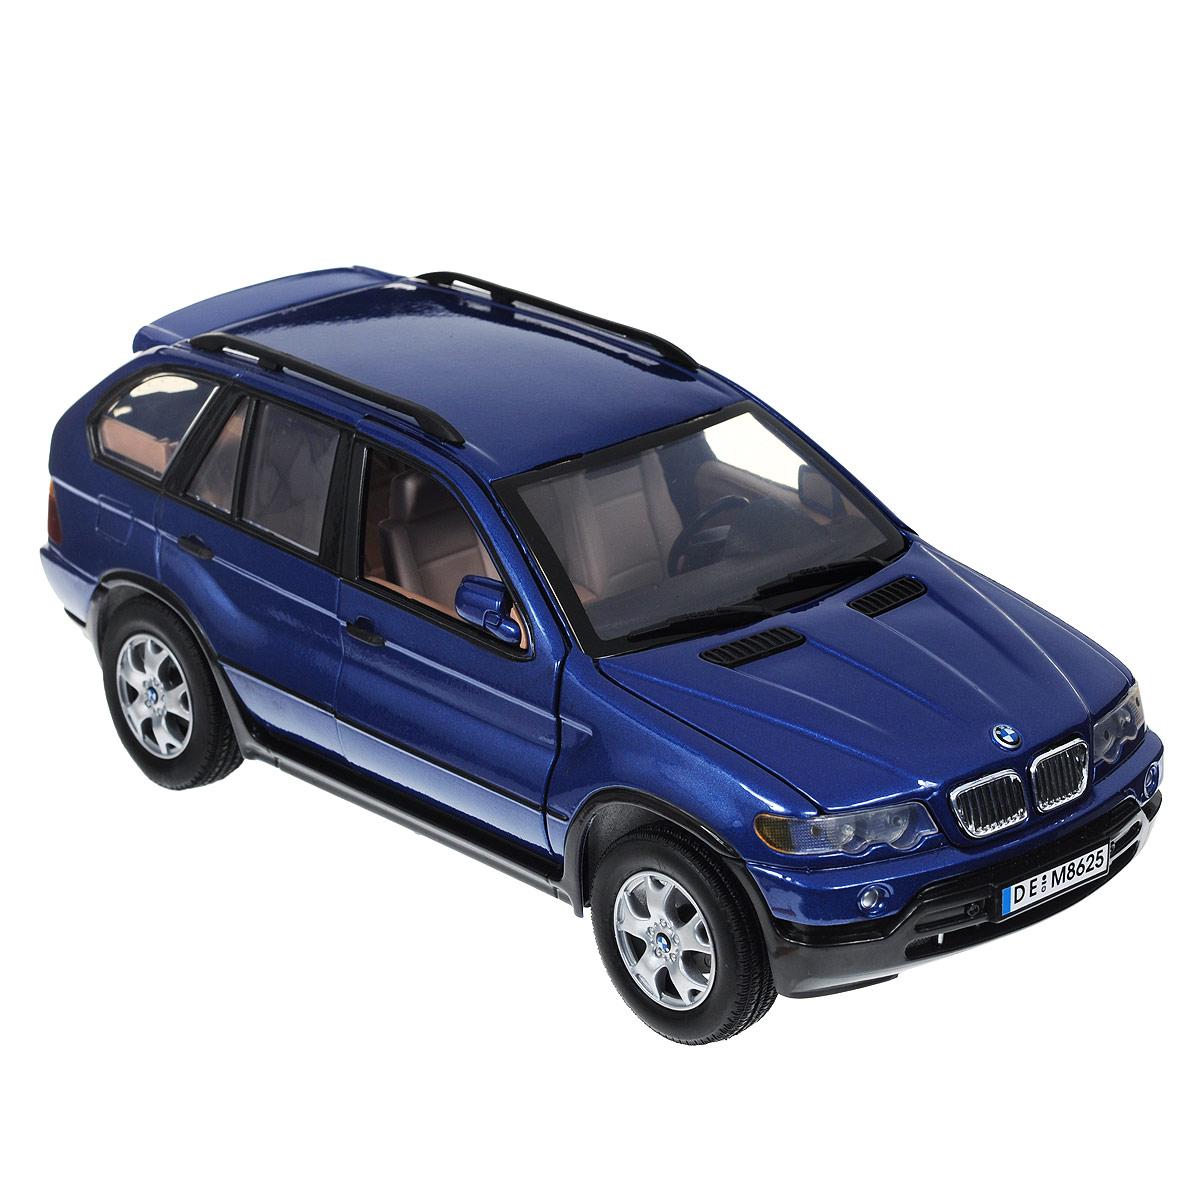 Autotime Коллекционная модель автомобиля BMW X5, цвет: синий. Масштаб 1/18 motormax модель автомобиля bmw z8 масштаб 1 60